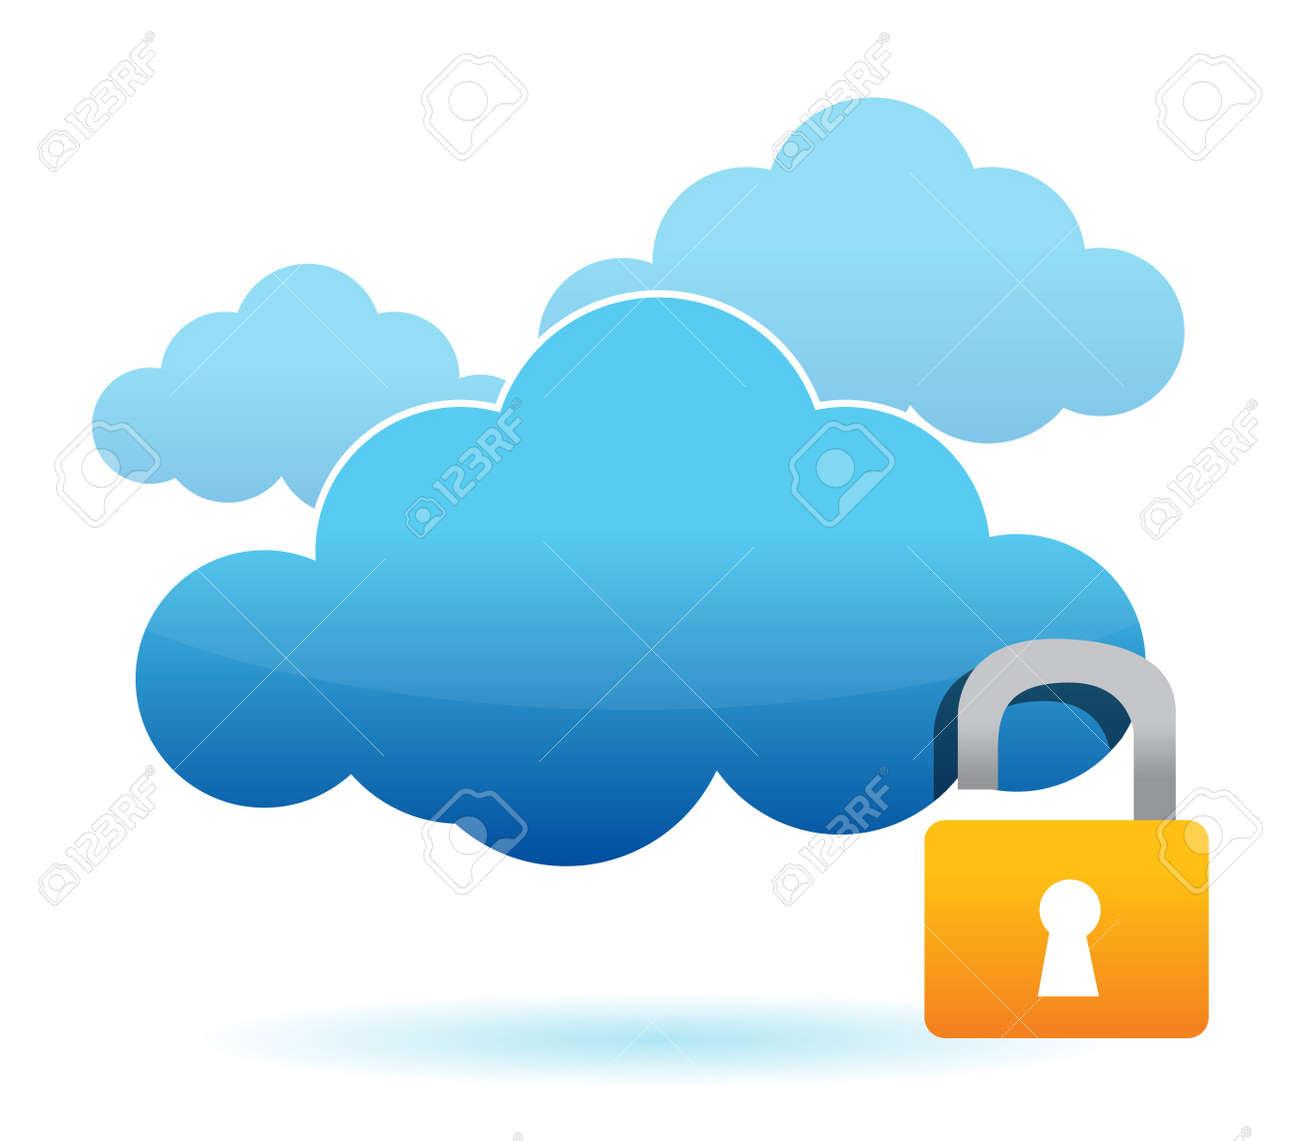 unlock cloud computer unsafe concept illustration design Stock Vector - 12784737